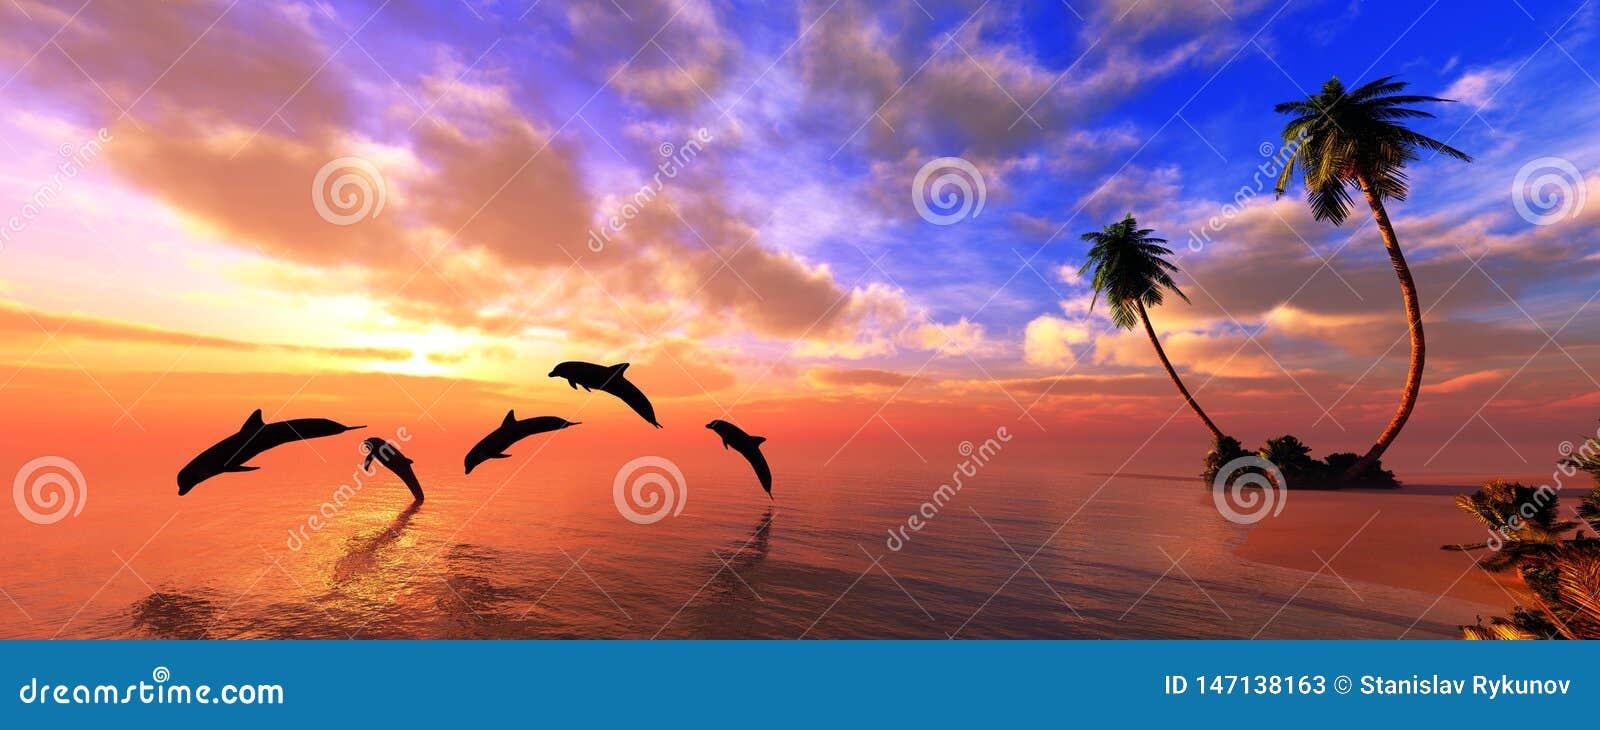 Mooi panorama van de overzeese zonsondergang